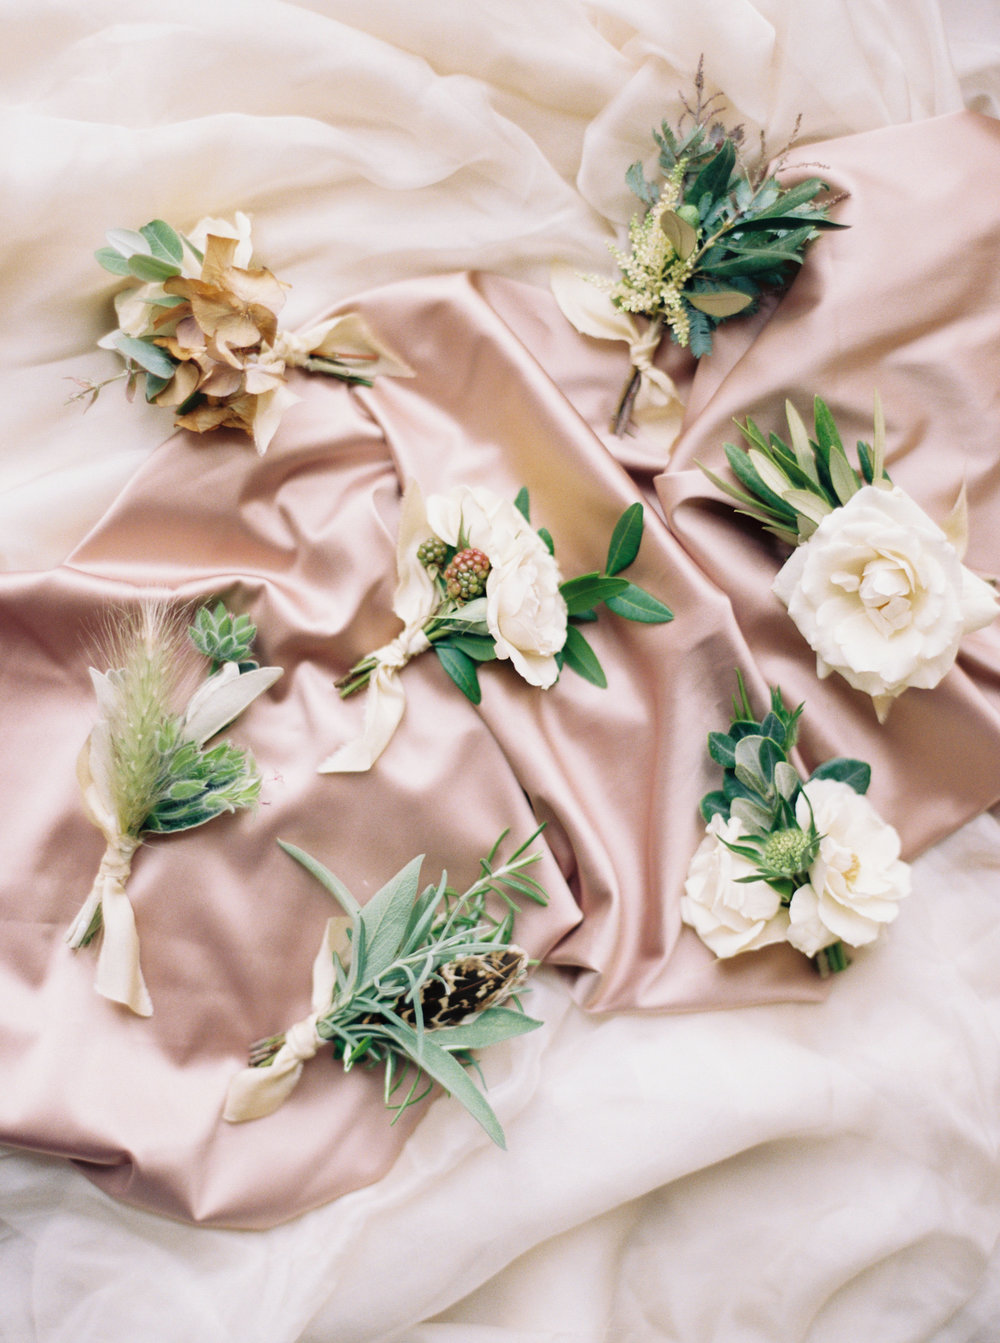 Luxury Wedding Planner UK | Lily & Sage | Old World Wedding European Style Wedding Blush Wedding Pink Wedding Buttonholes Boutonnières English Country House Wedding Green and White Wedding | Nicole Colwell Photography-0140.jpg